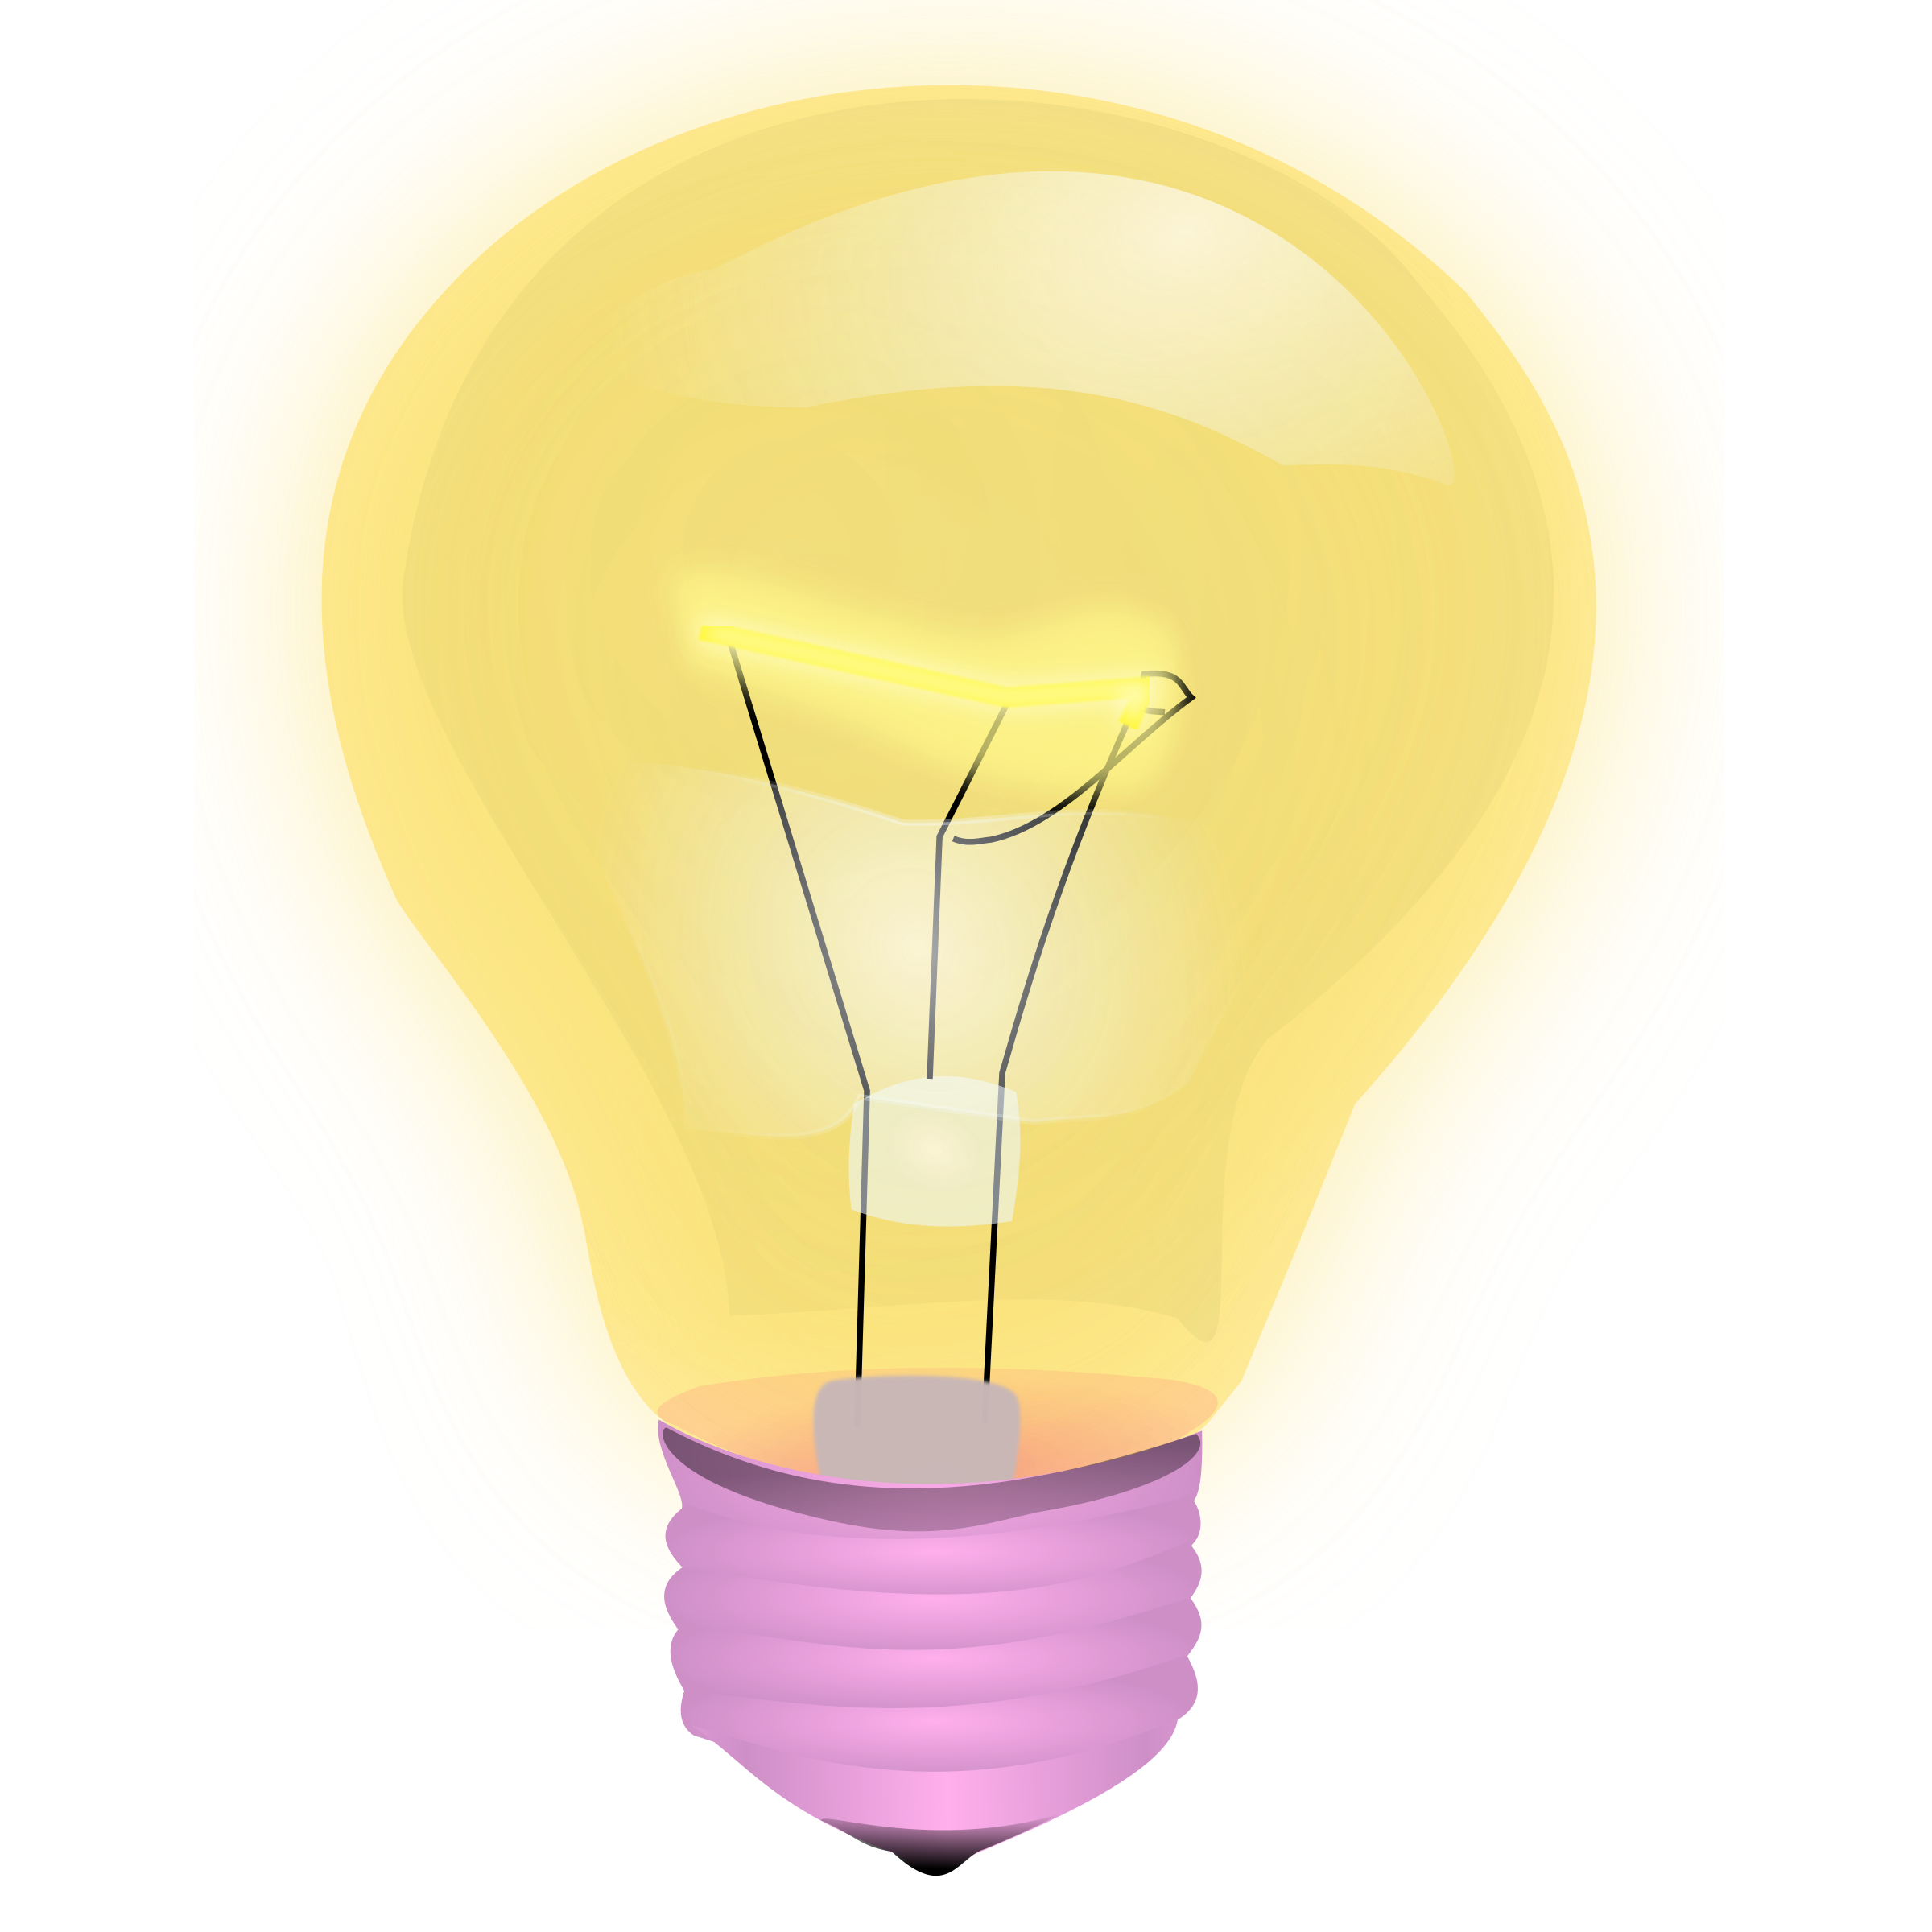 Light Bulb Vector Clipart image - Free stock photo ...